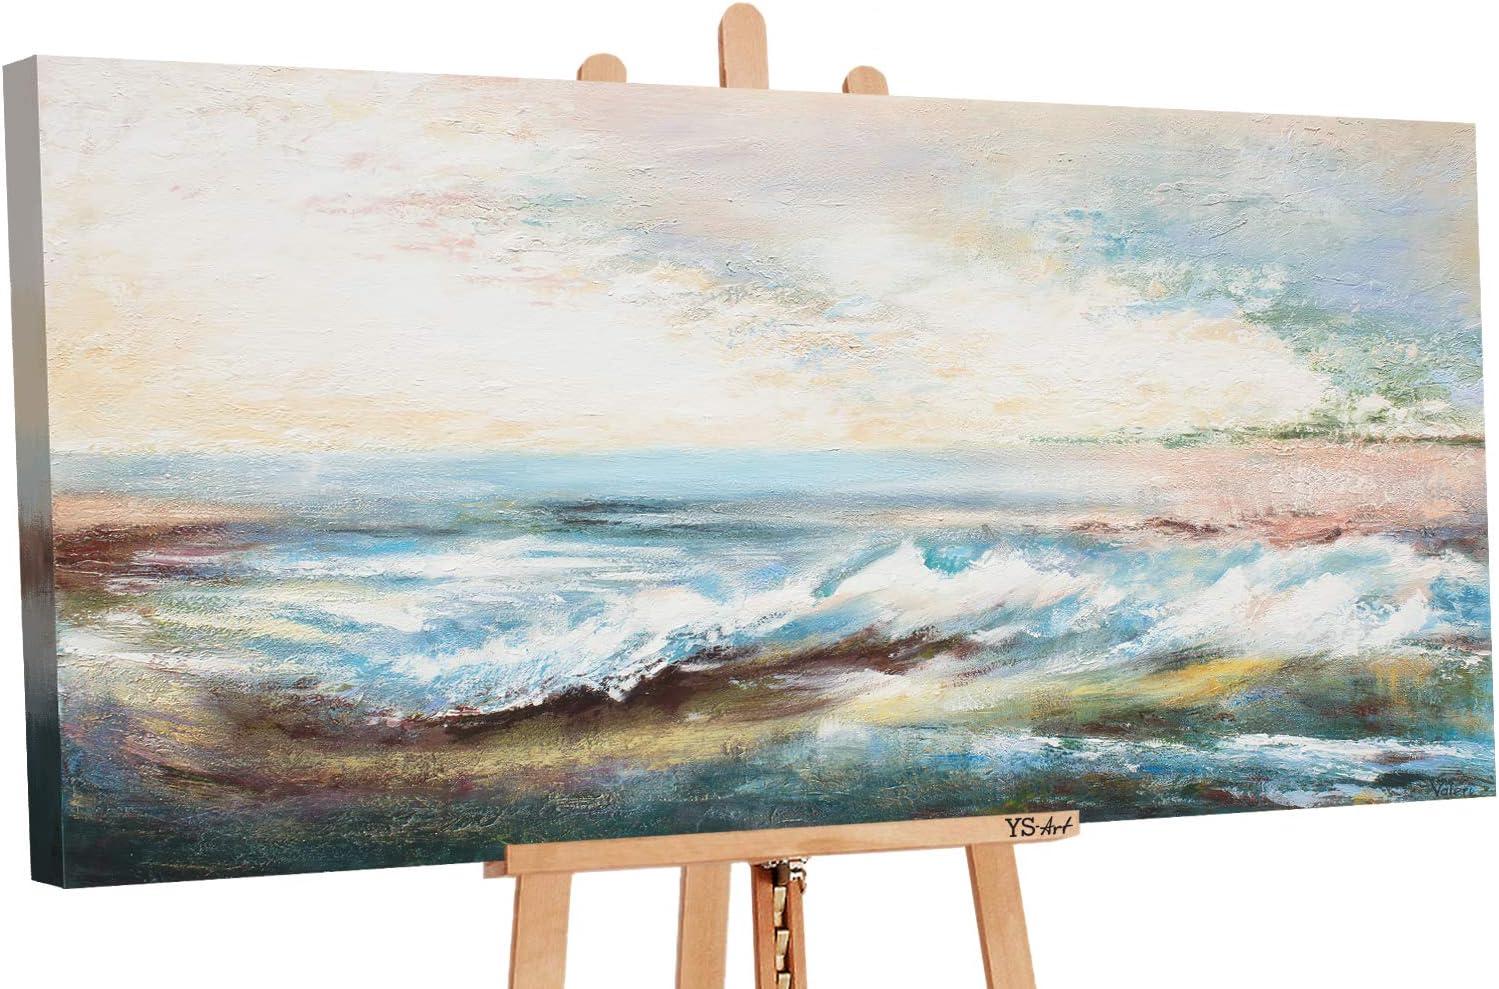 YS-Art | Cuadro Pintado a Mano Paisaje Marina | Cuadro Moderno acrilico | 130x70 cm | Lienzo Pintado a Mano | Cuadros Dormitories | único | De Color Beige